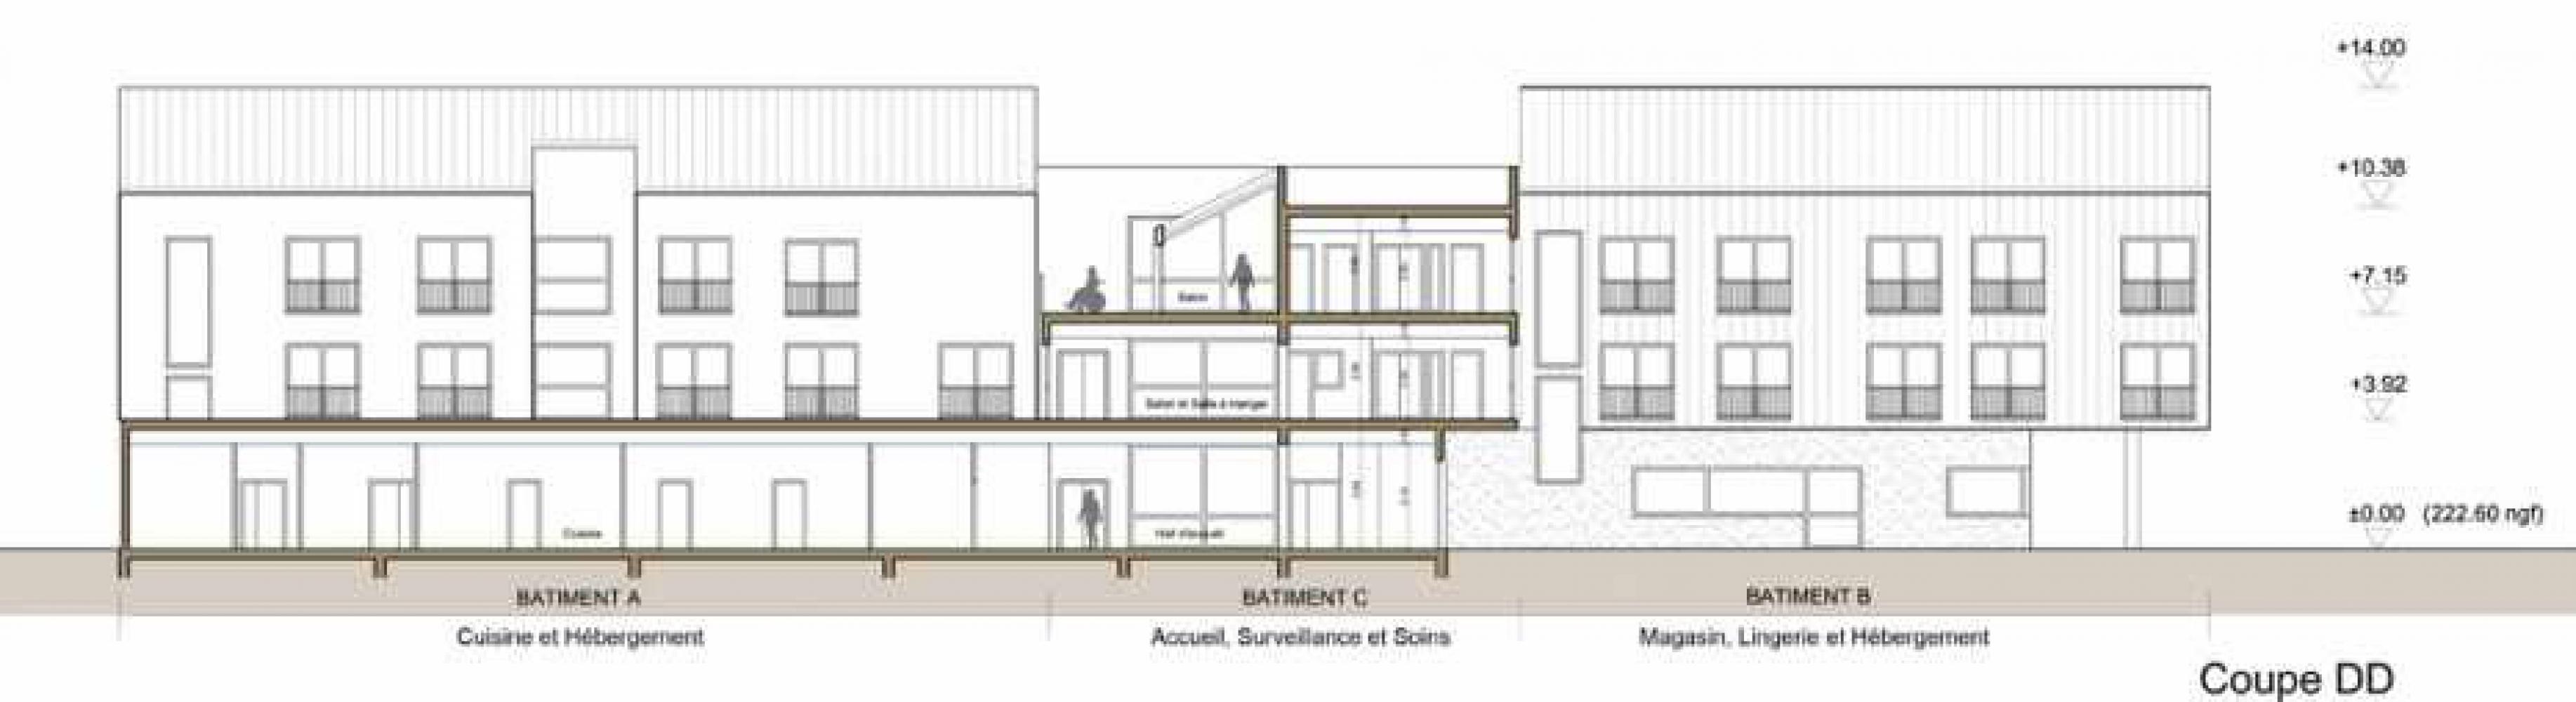 coupe_dd Pascale SEURIN Architecte - Médico-Social